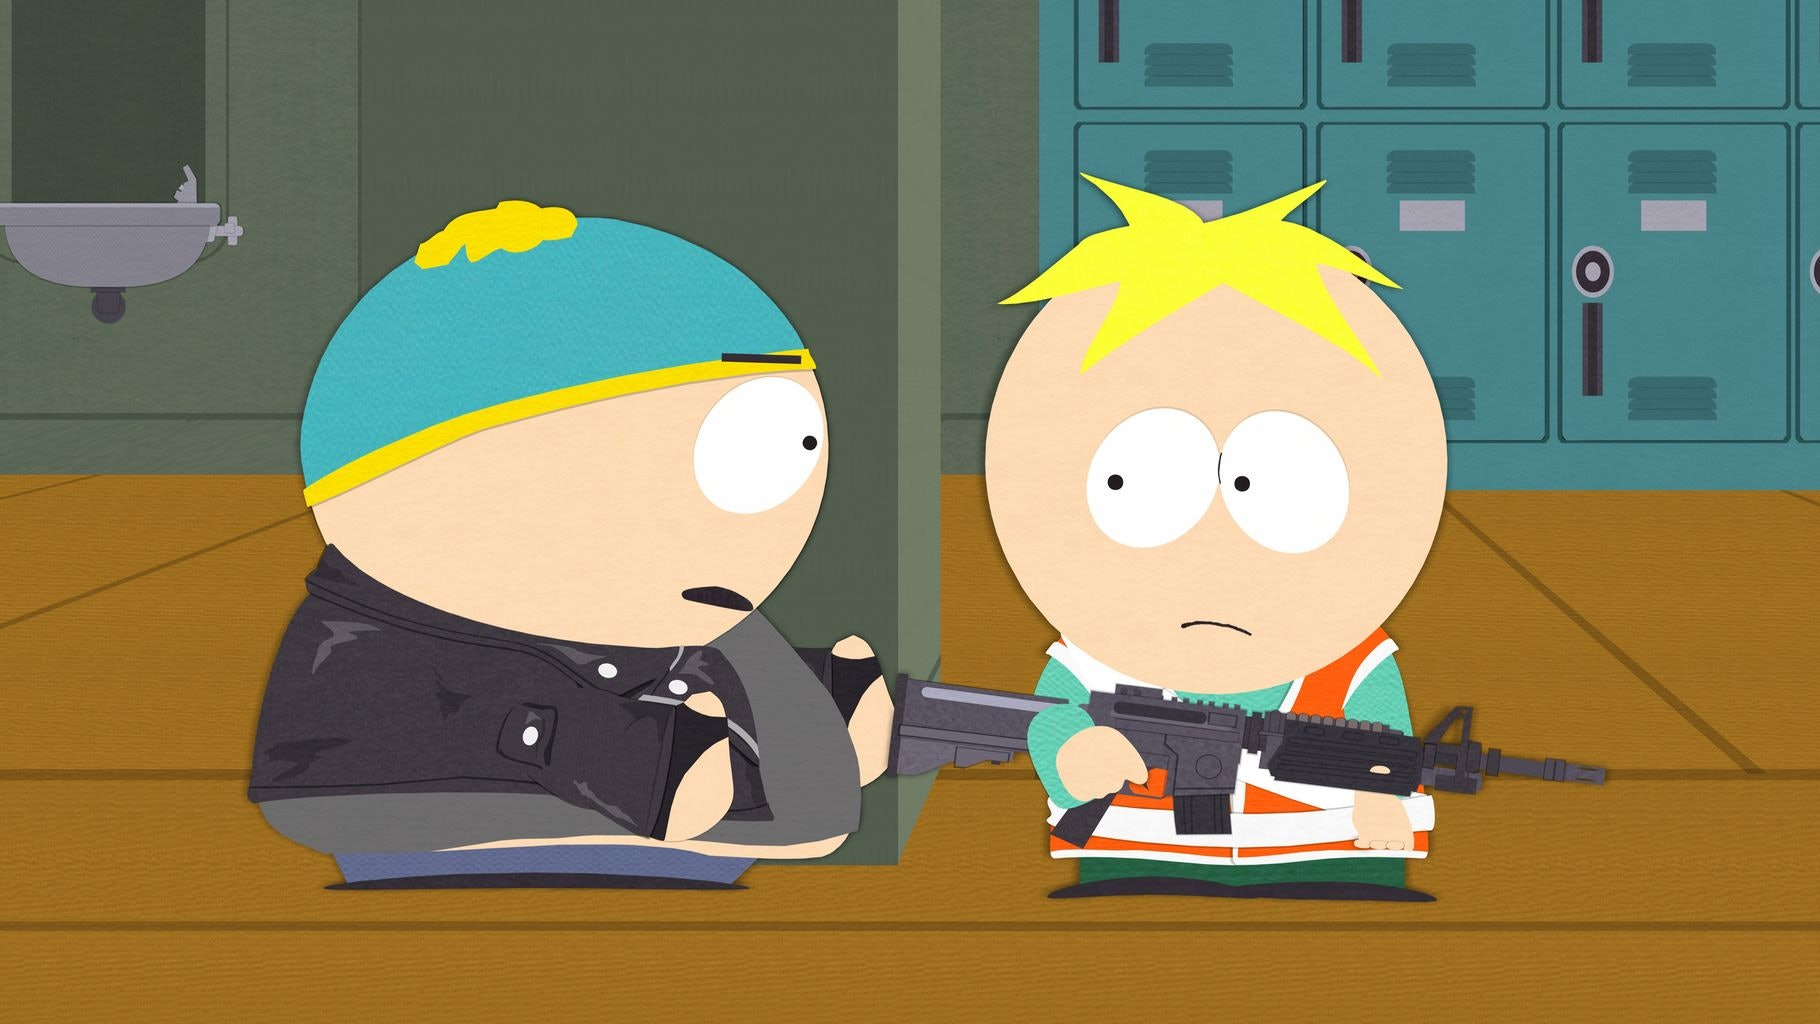 Southpark New Season 2019 When Does 'South Park' Come Back? Trey Parker & Matt Stone Will